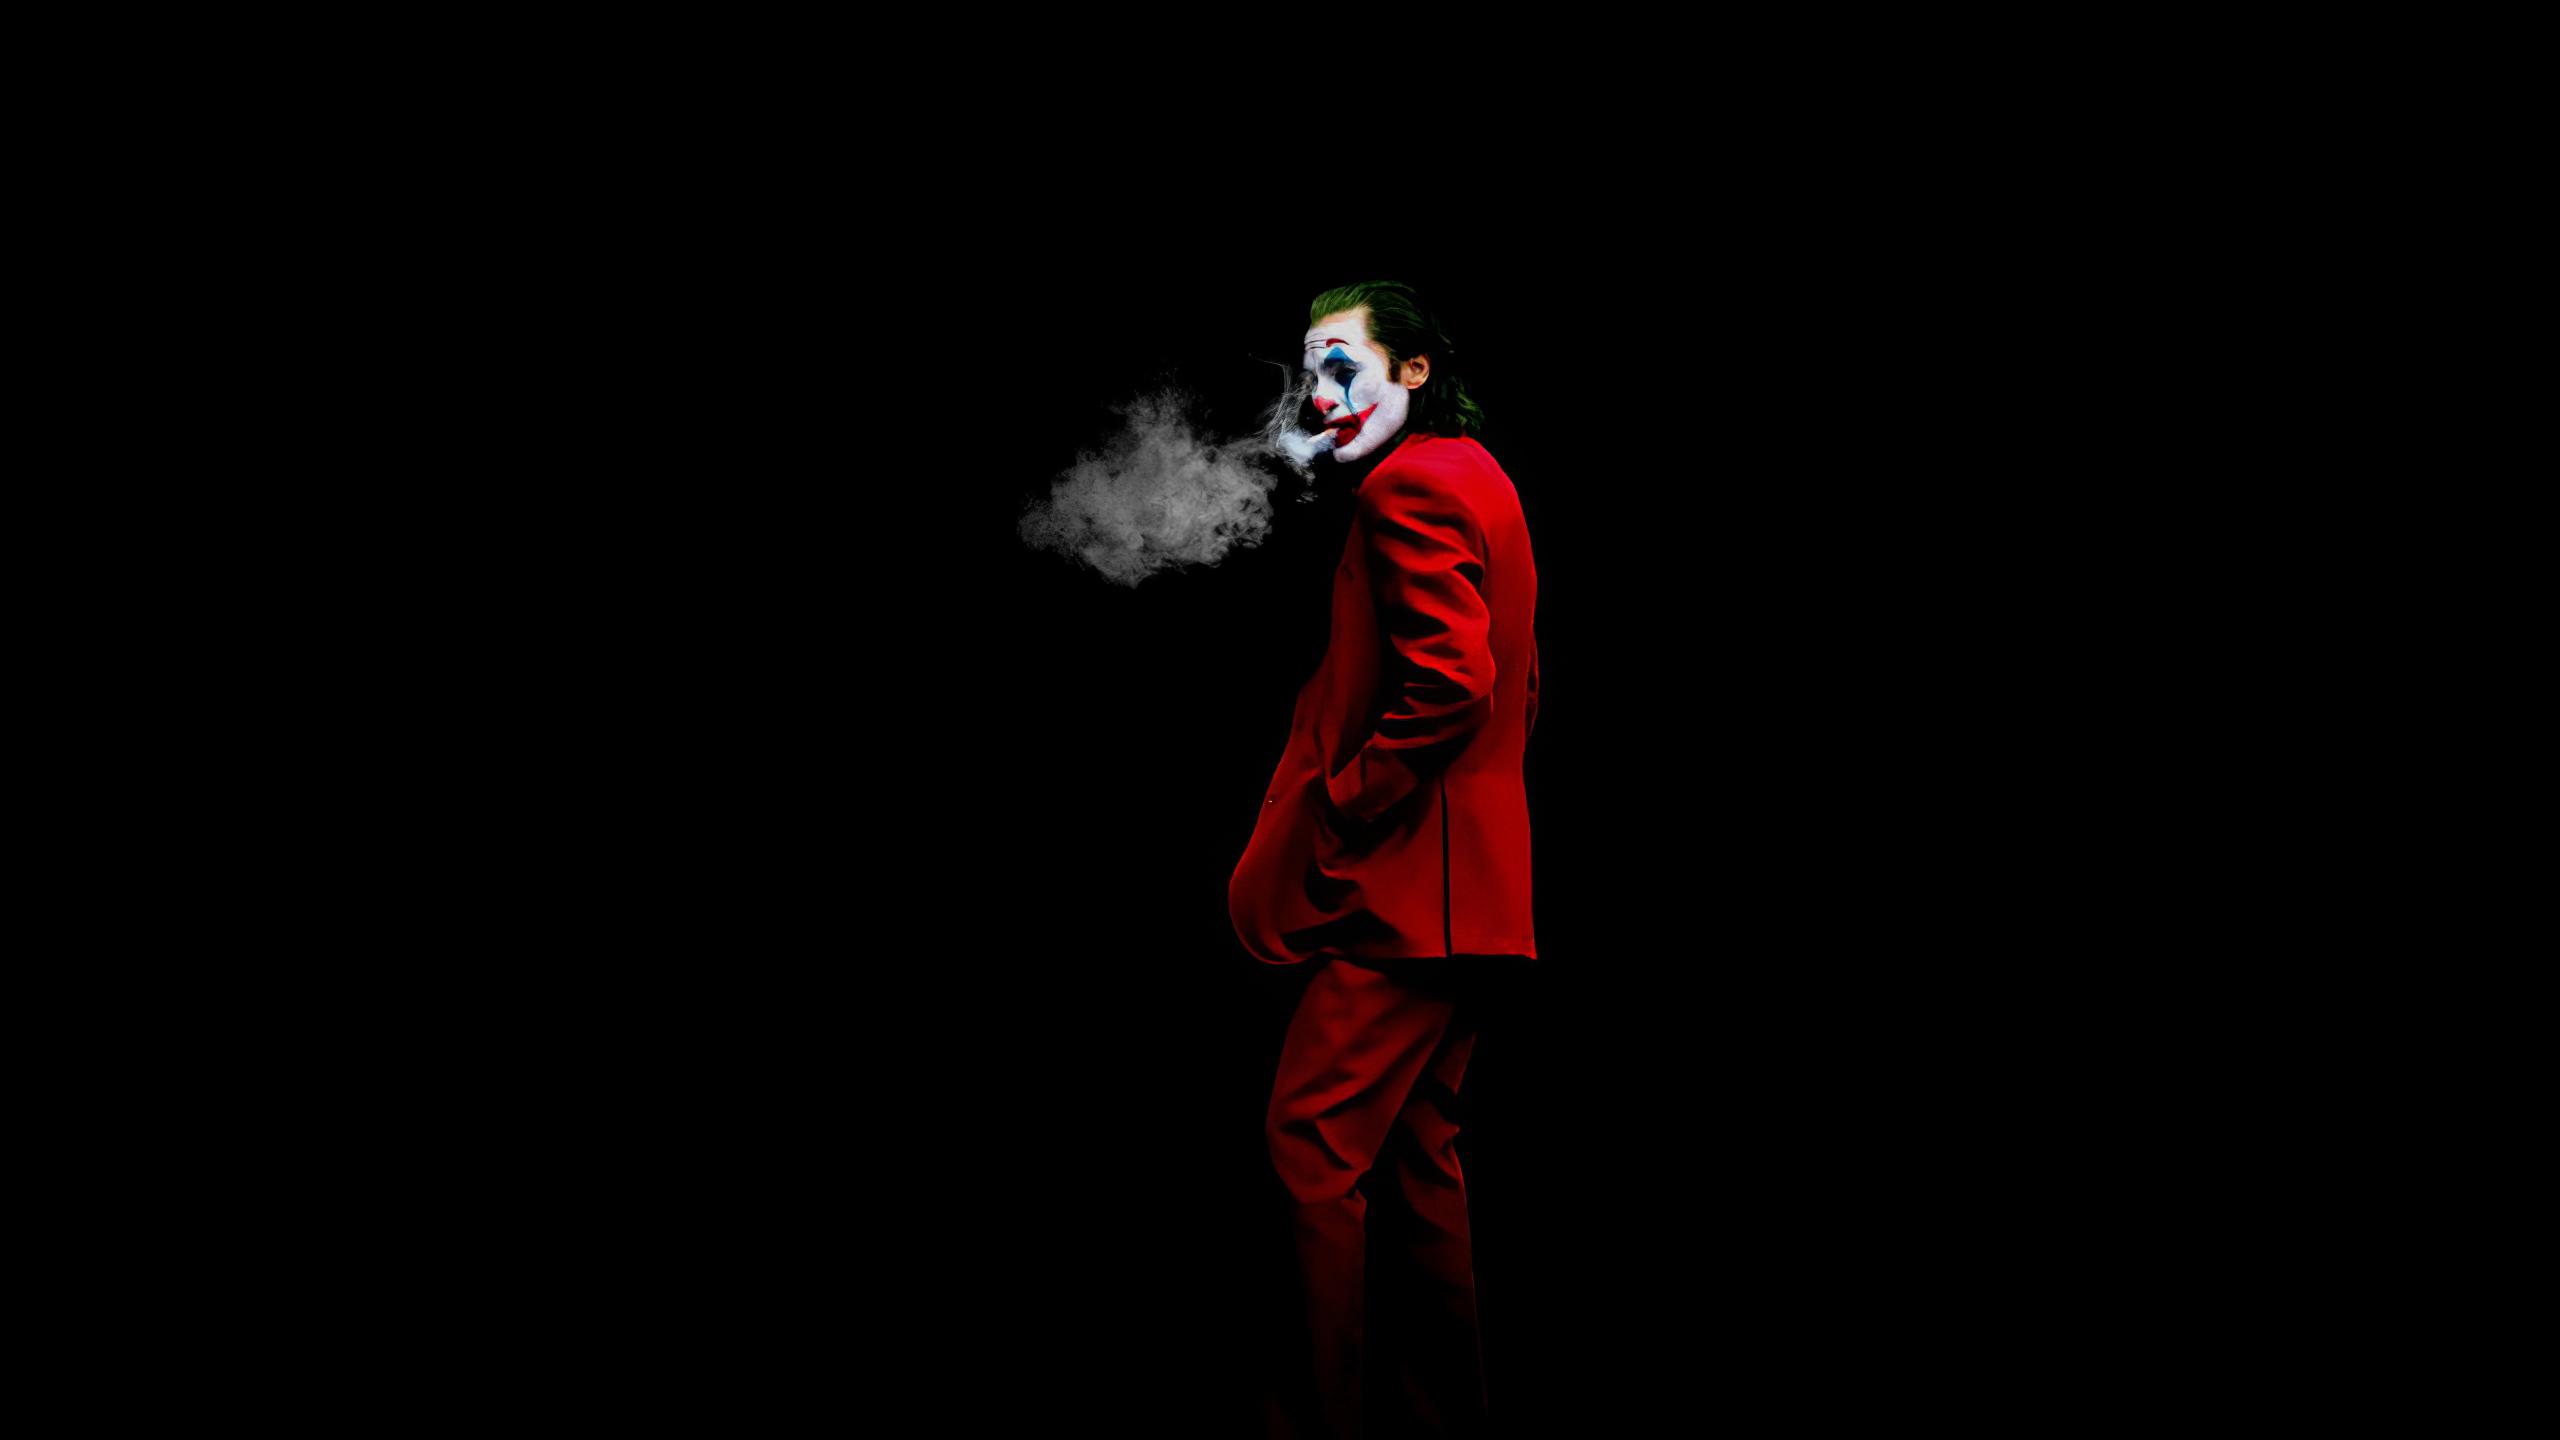 3840x2160 New Joker 2020 Art 4K Wallpaper, HD Superheroes ...